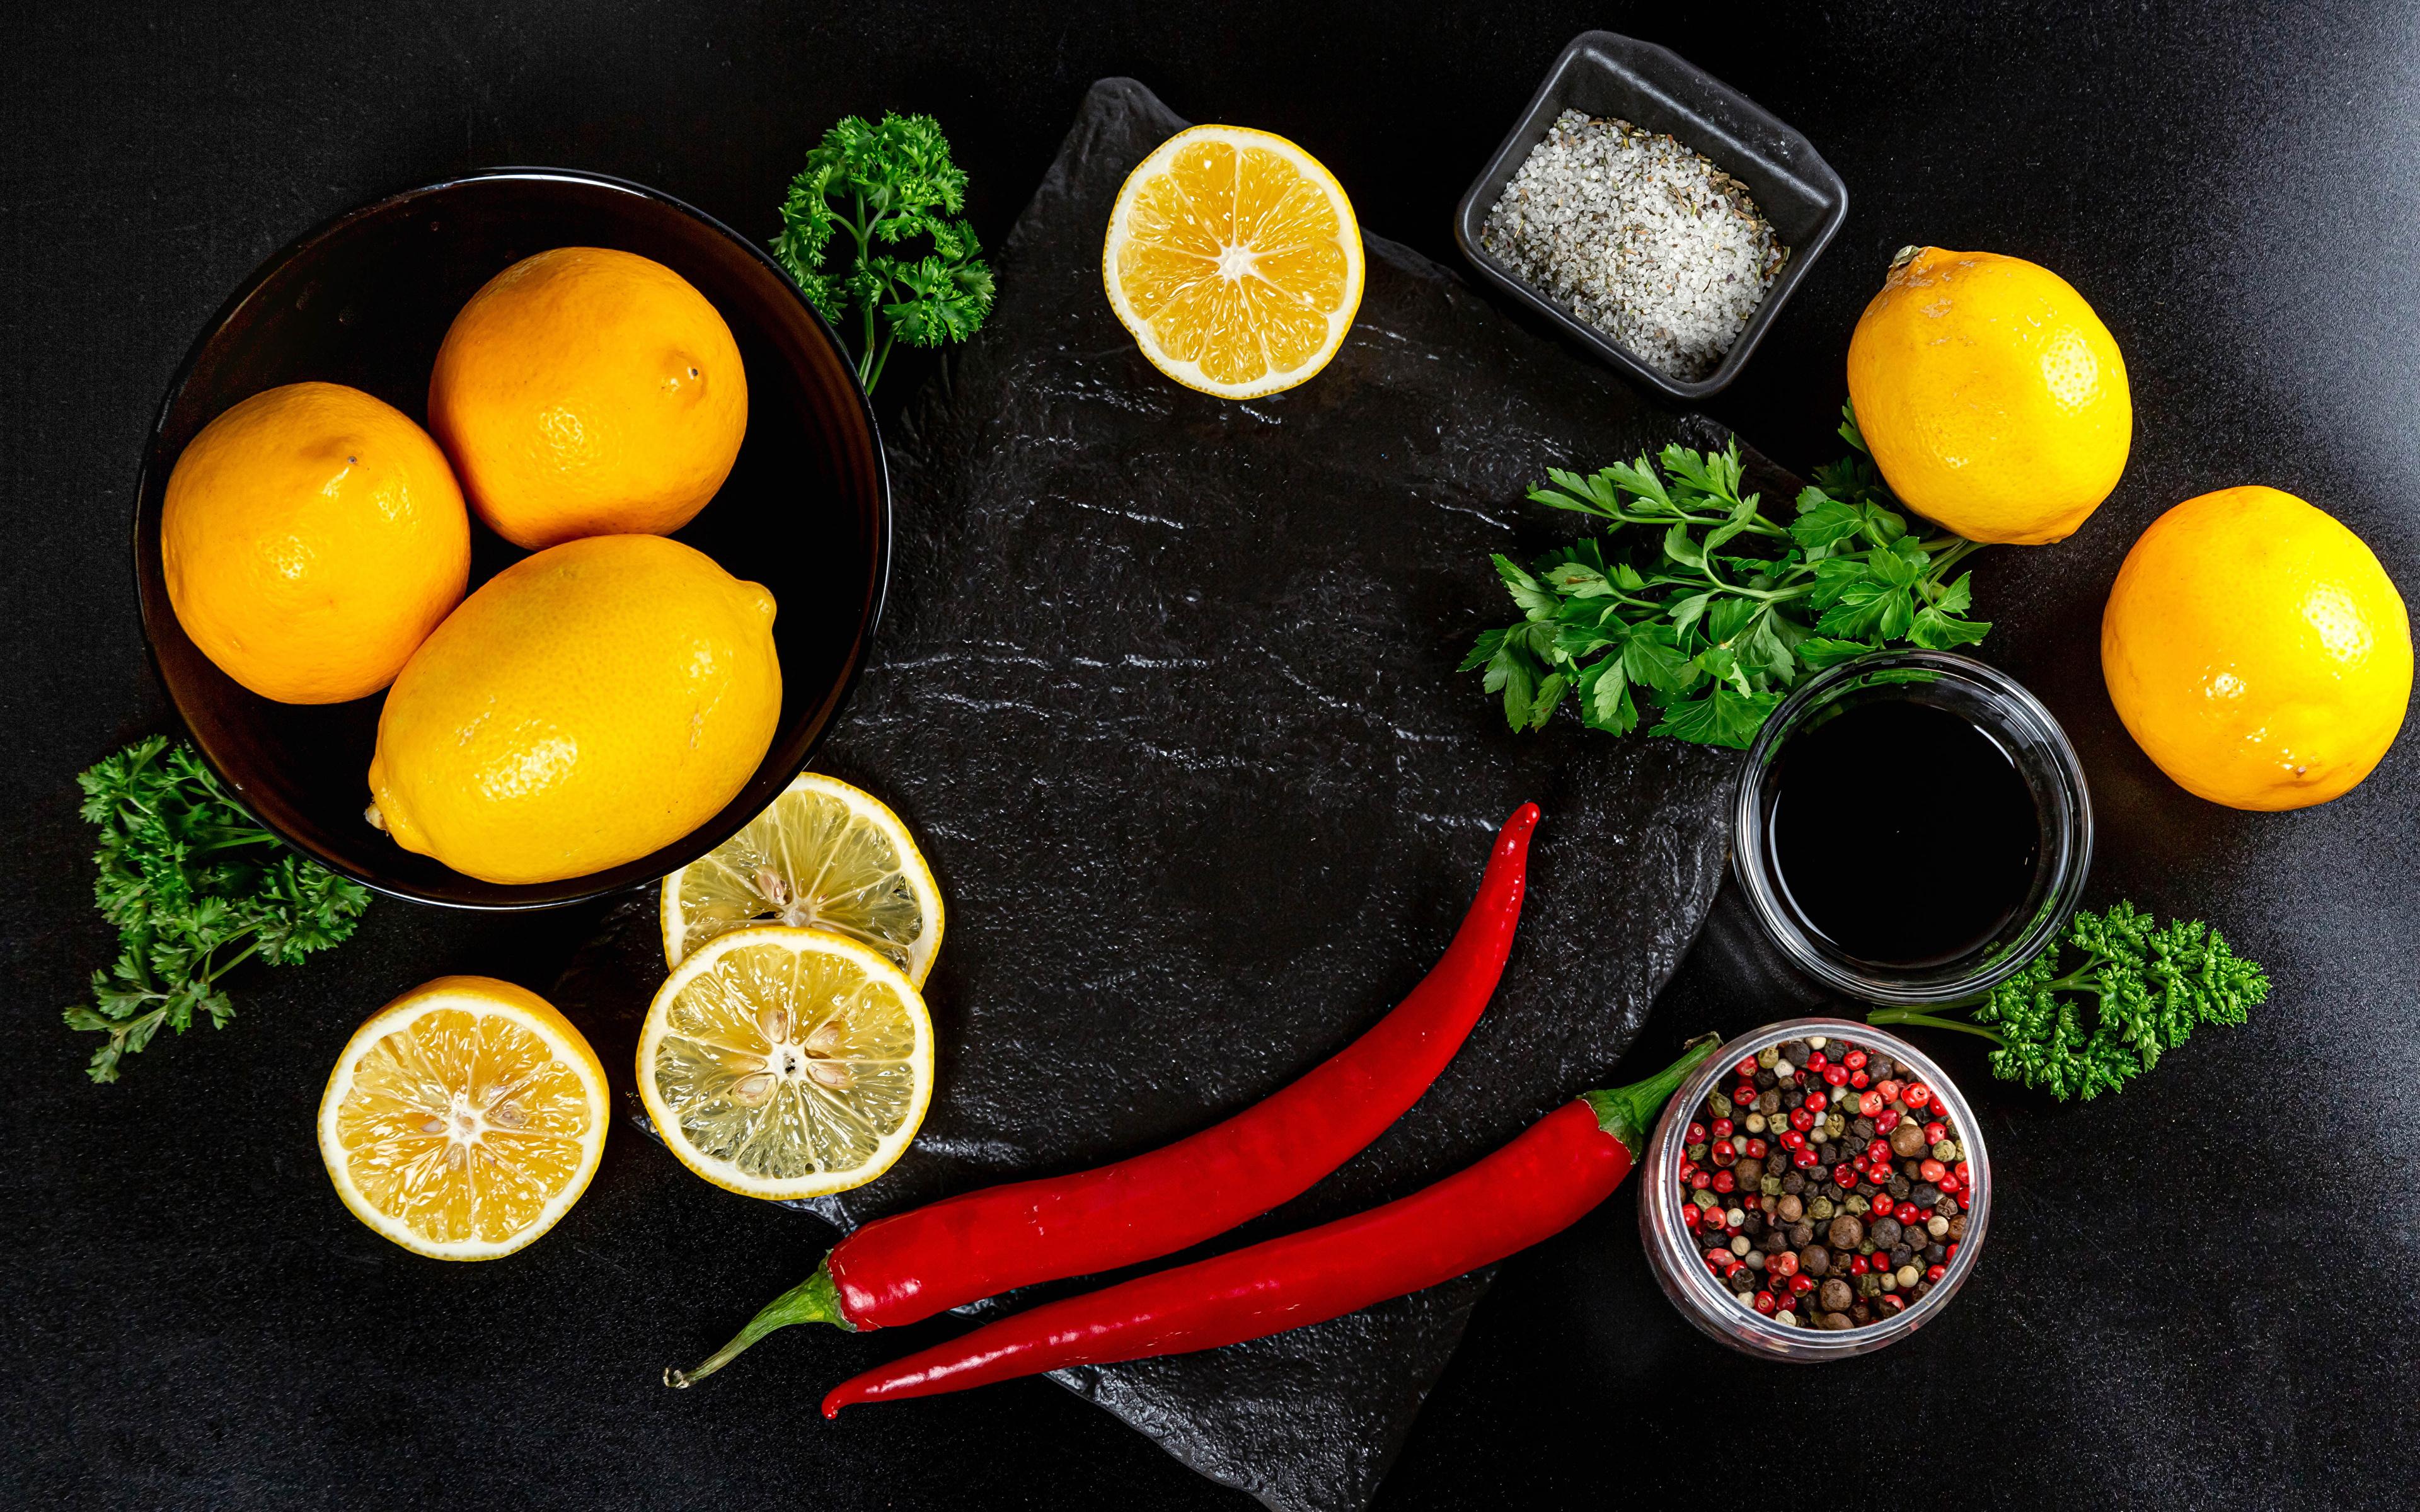 Image Orange fruit Chili pepper Black pepper Salt Lemons Food Vegetables 3840x2400